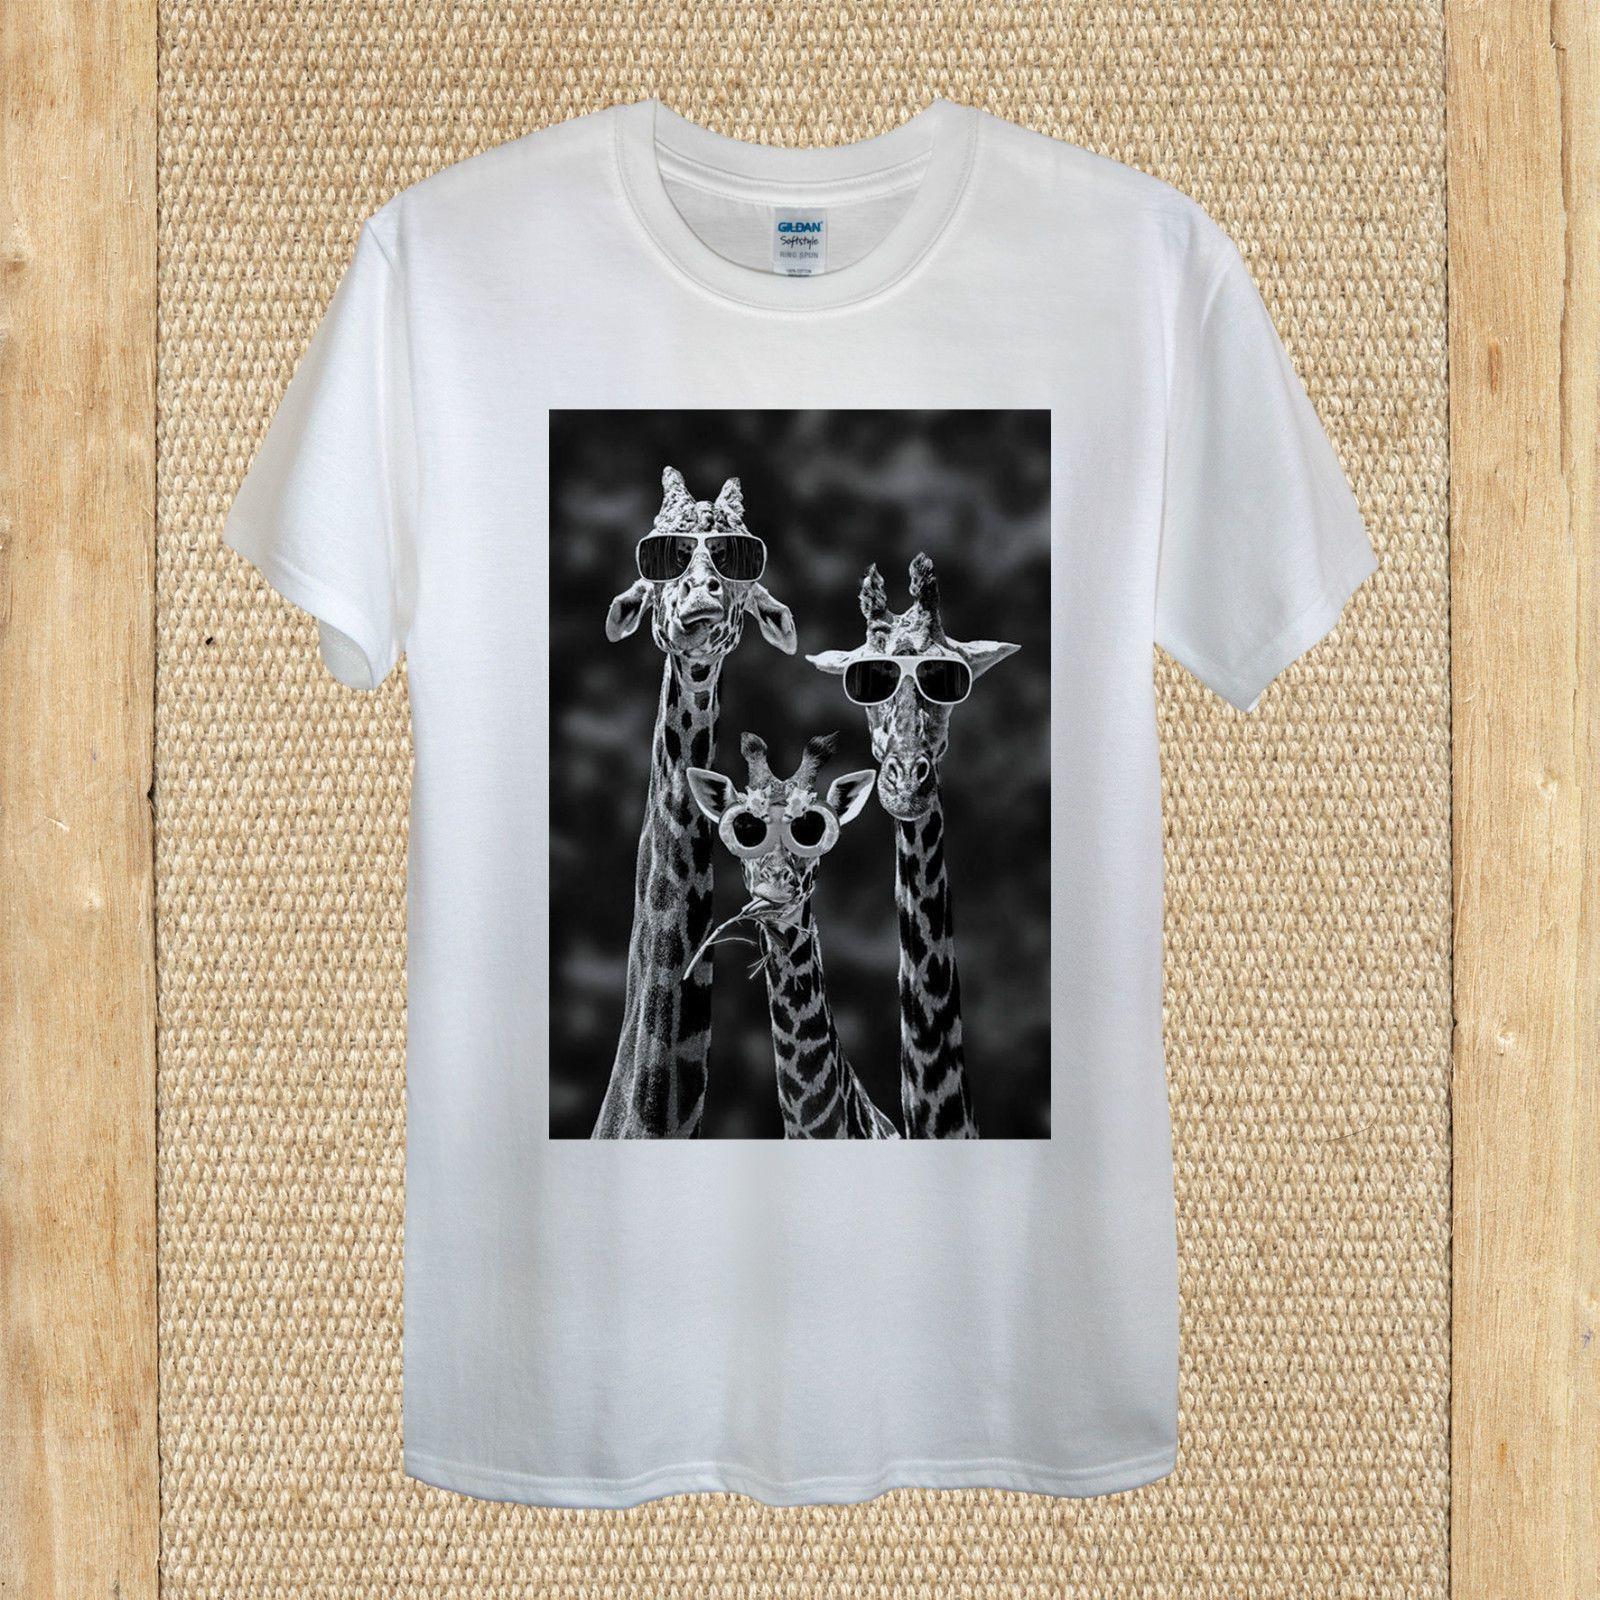 c2b33897 Giraffes On Vacation T Shirt / Funny Family Holiday Summer Unisex Women  FittedMens 2018 Fashion Brand T Shirt Buy Tshirt Political Shirts From  Teesworld, ...